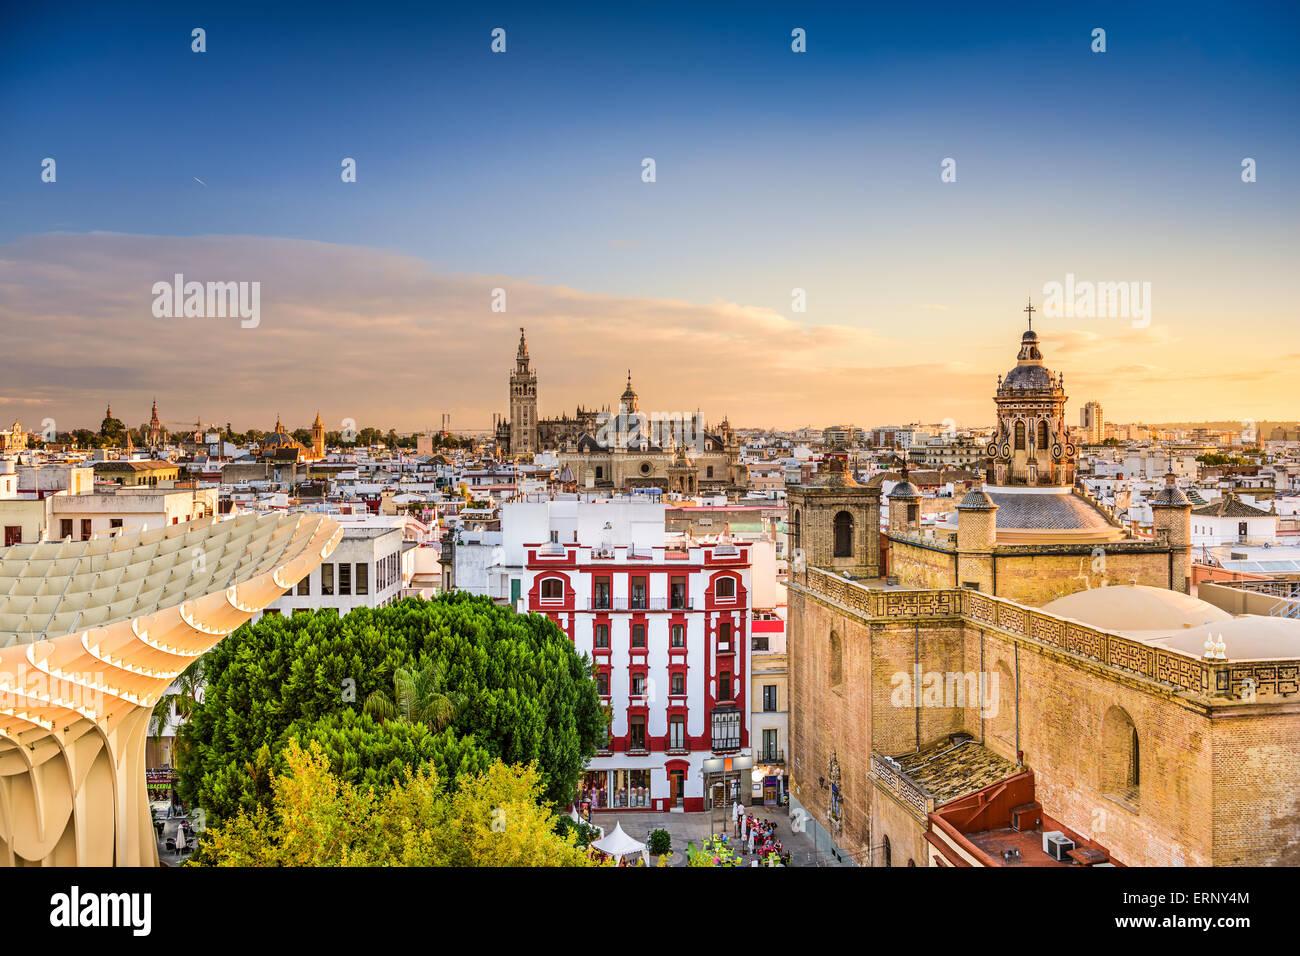 Seville, Spain old quarter skyline at dusk. - Stock Image